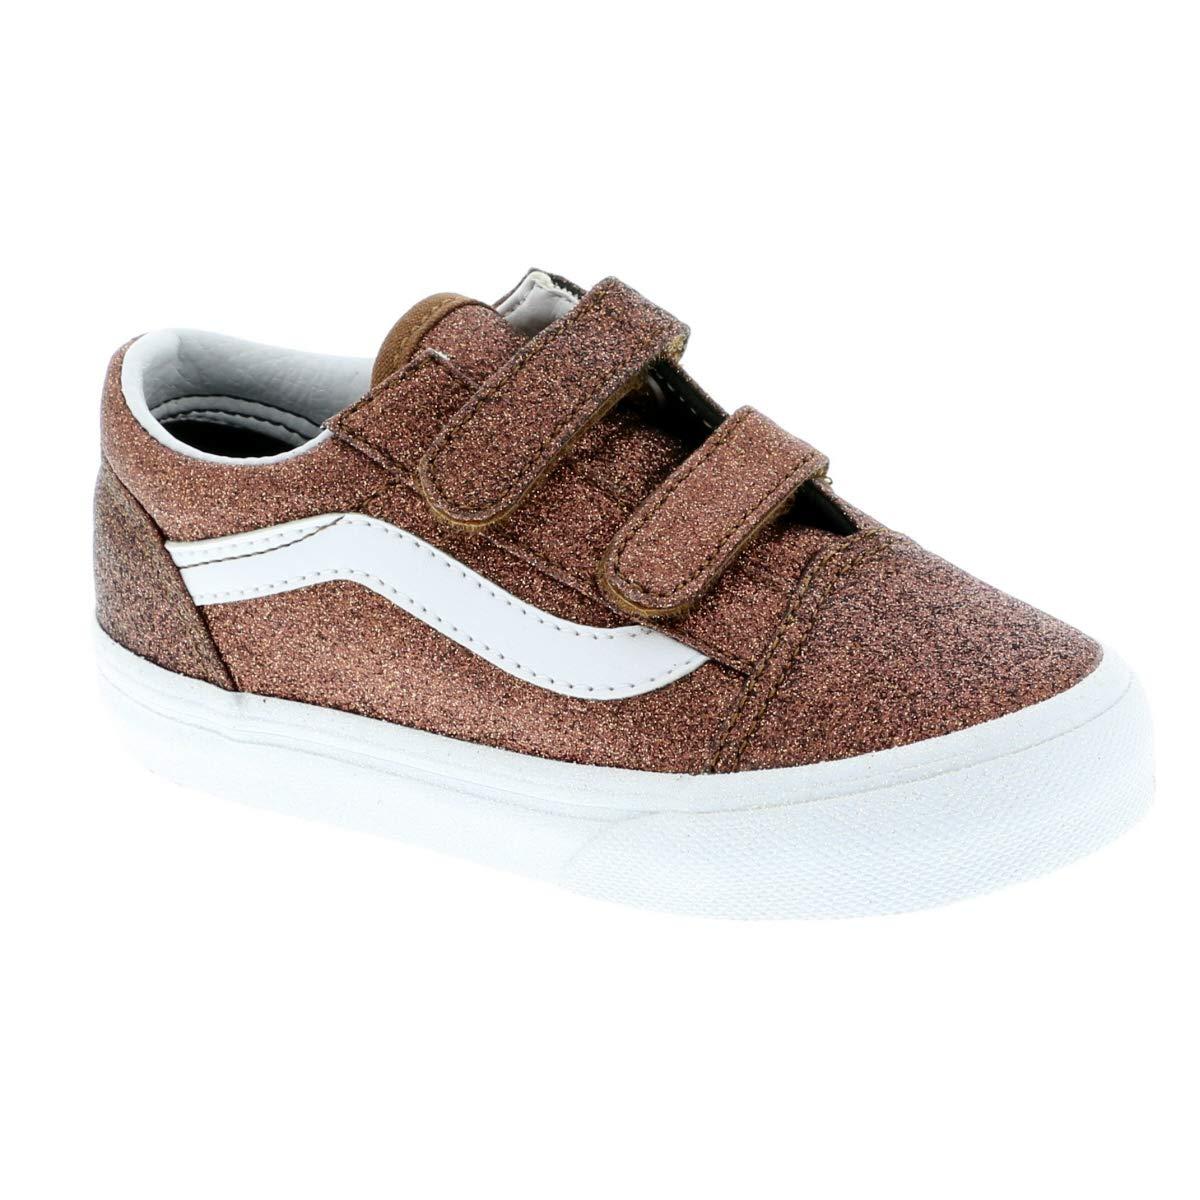 ff5d2919ee Vans girl baby shoes bags jpg 1200x1200 Baby girl vans